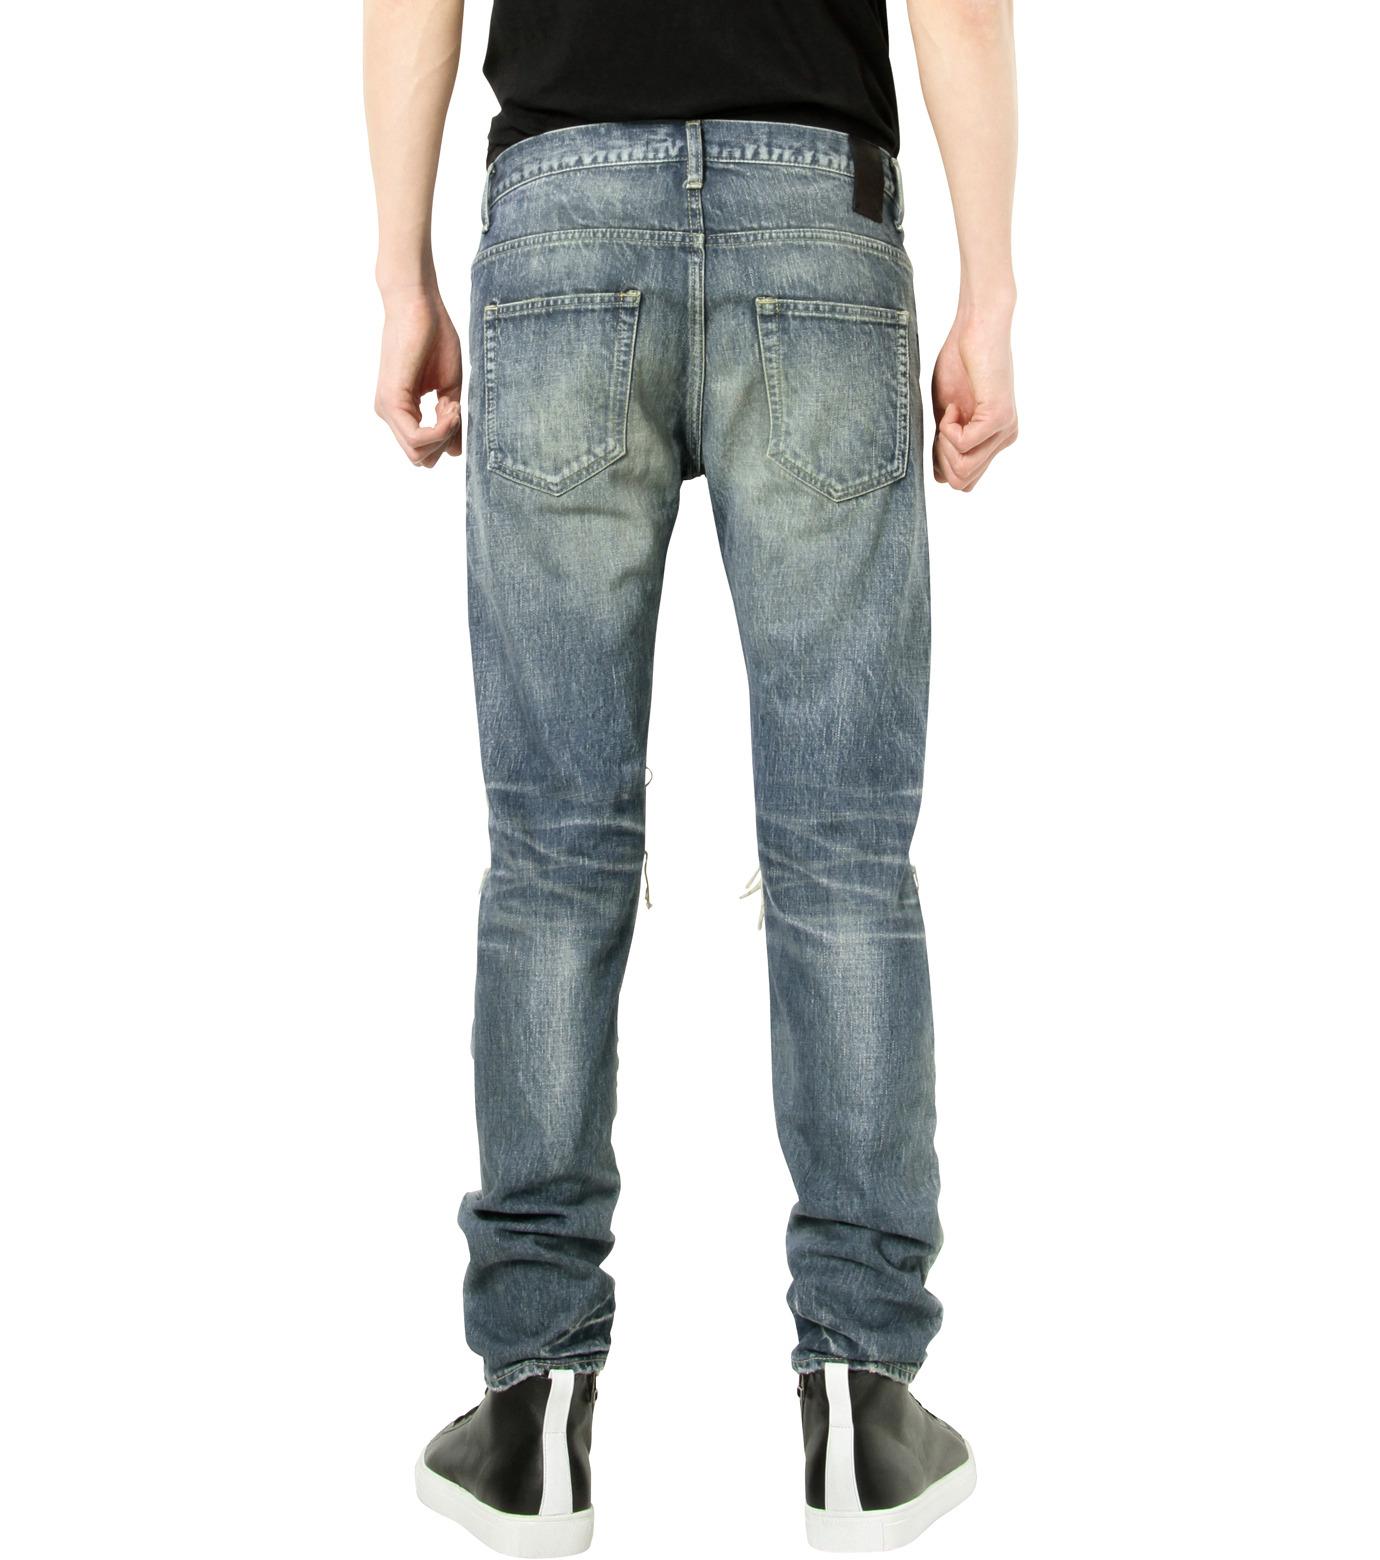 HL HEDDIE LOVU(エイチエル・エディールーヴ)のDamage Denim PT-BLUE(パンツ/pants)-17S98003-92 拡大詳細画像2